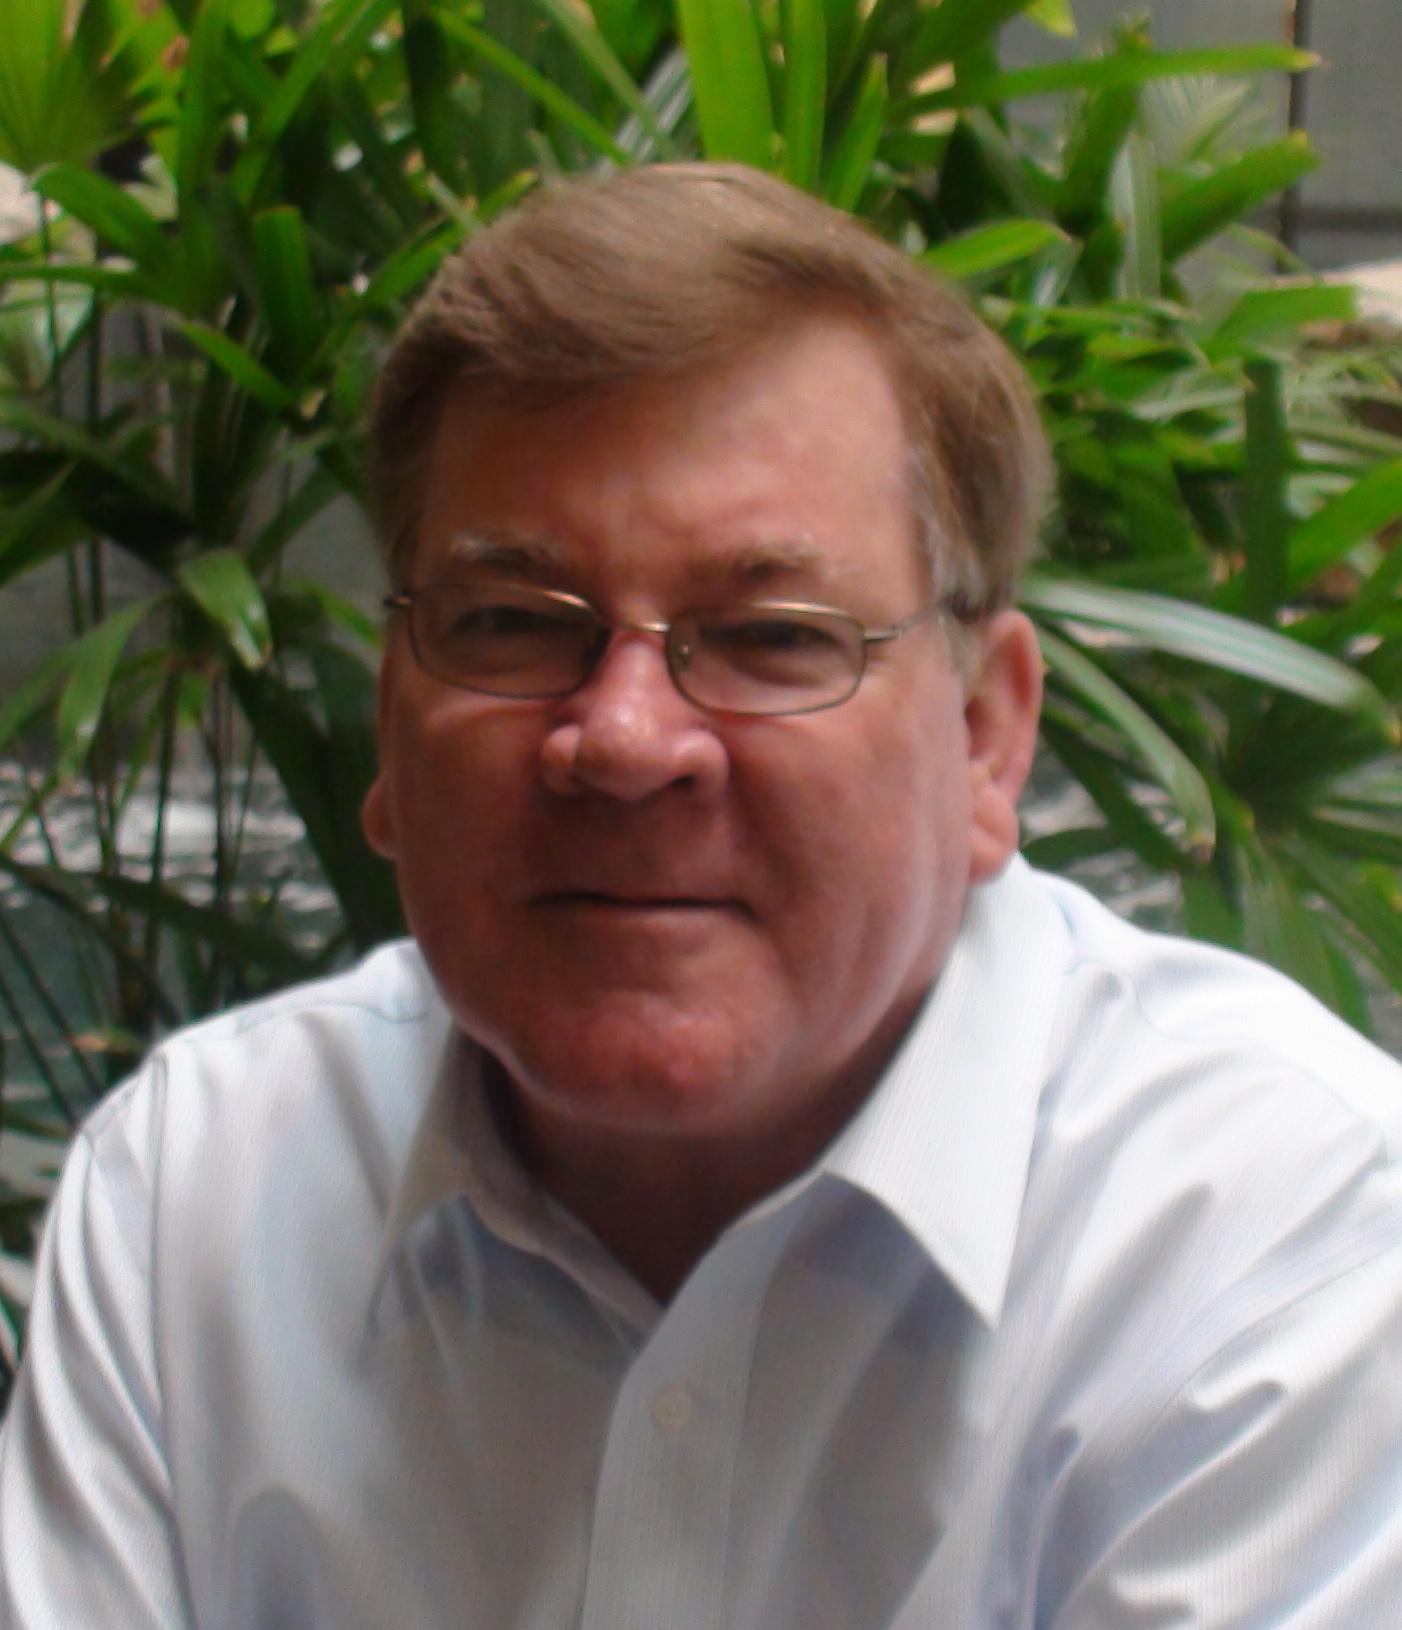 Mike Derrick